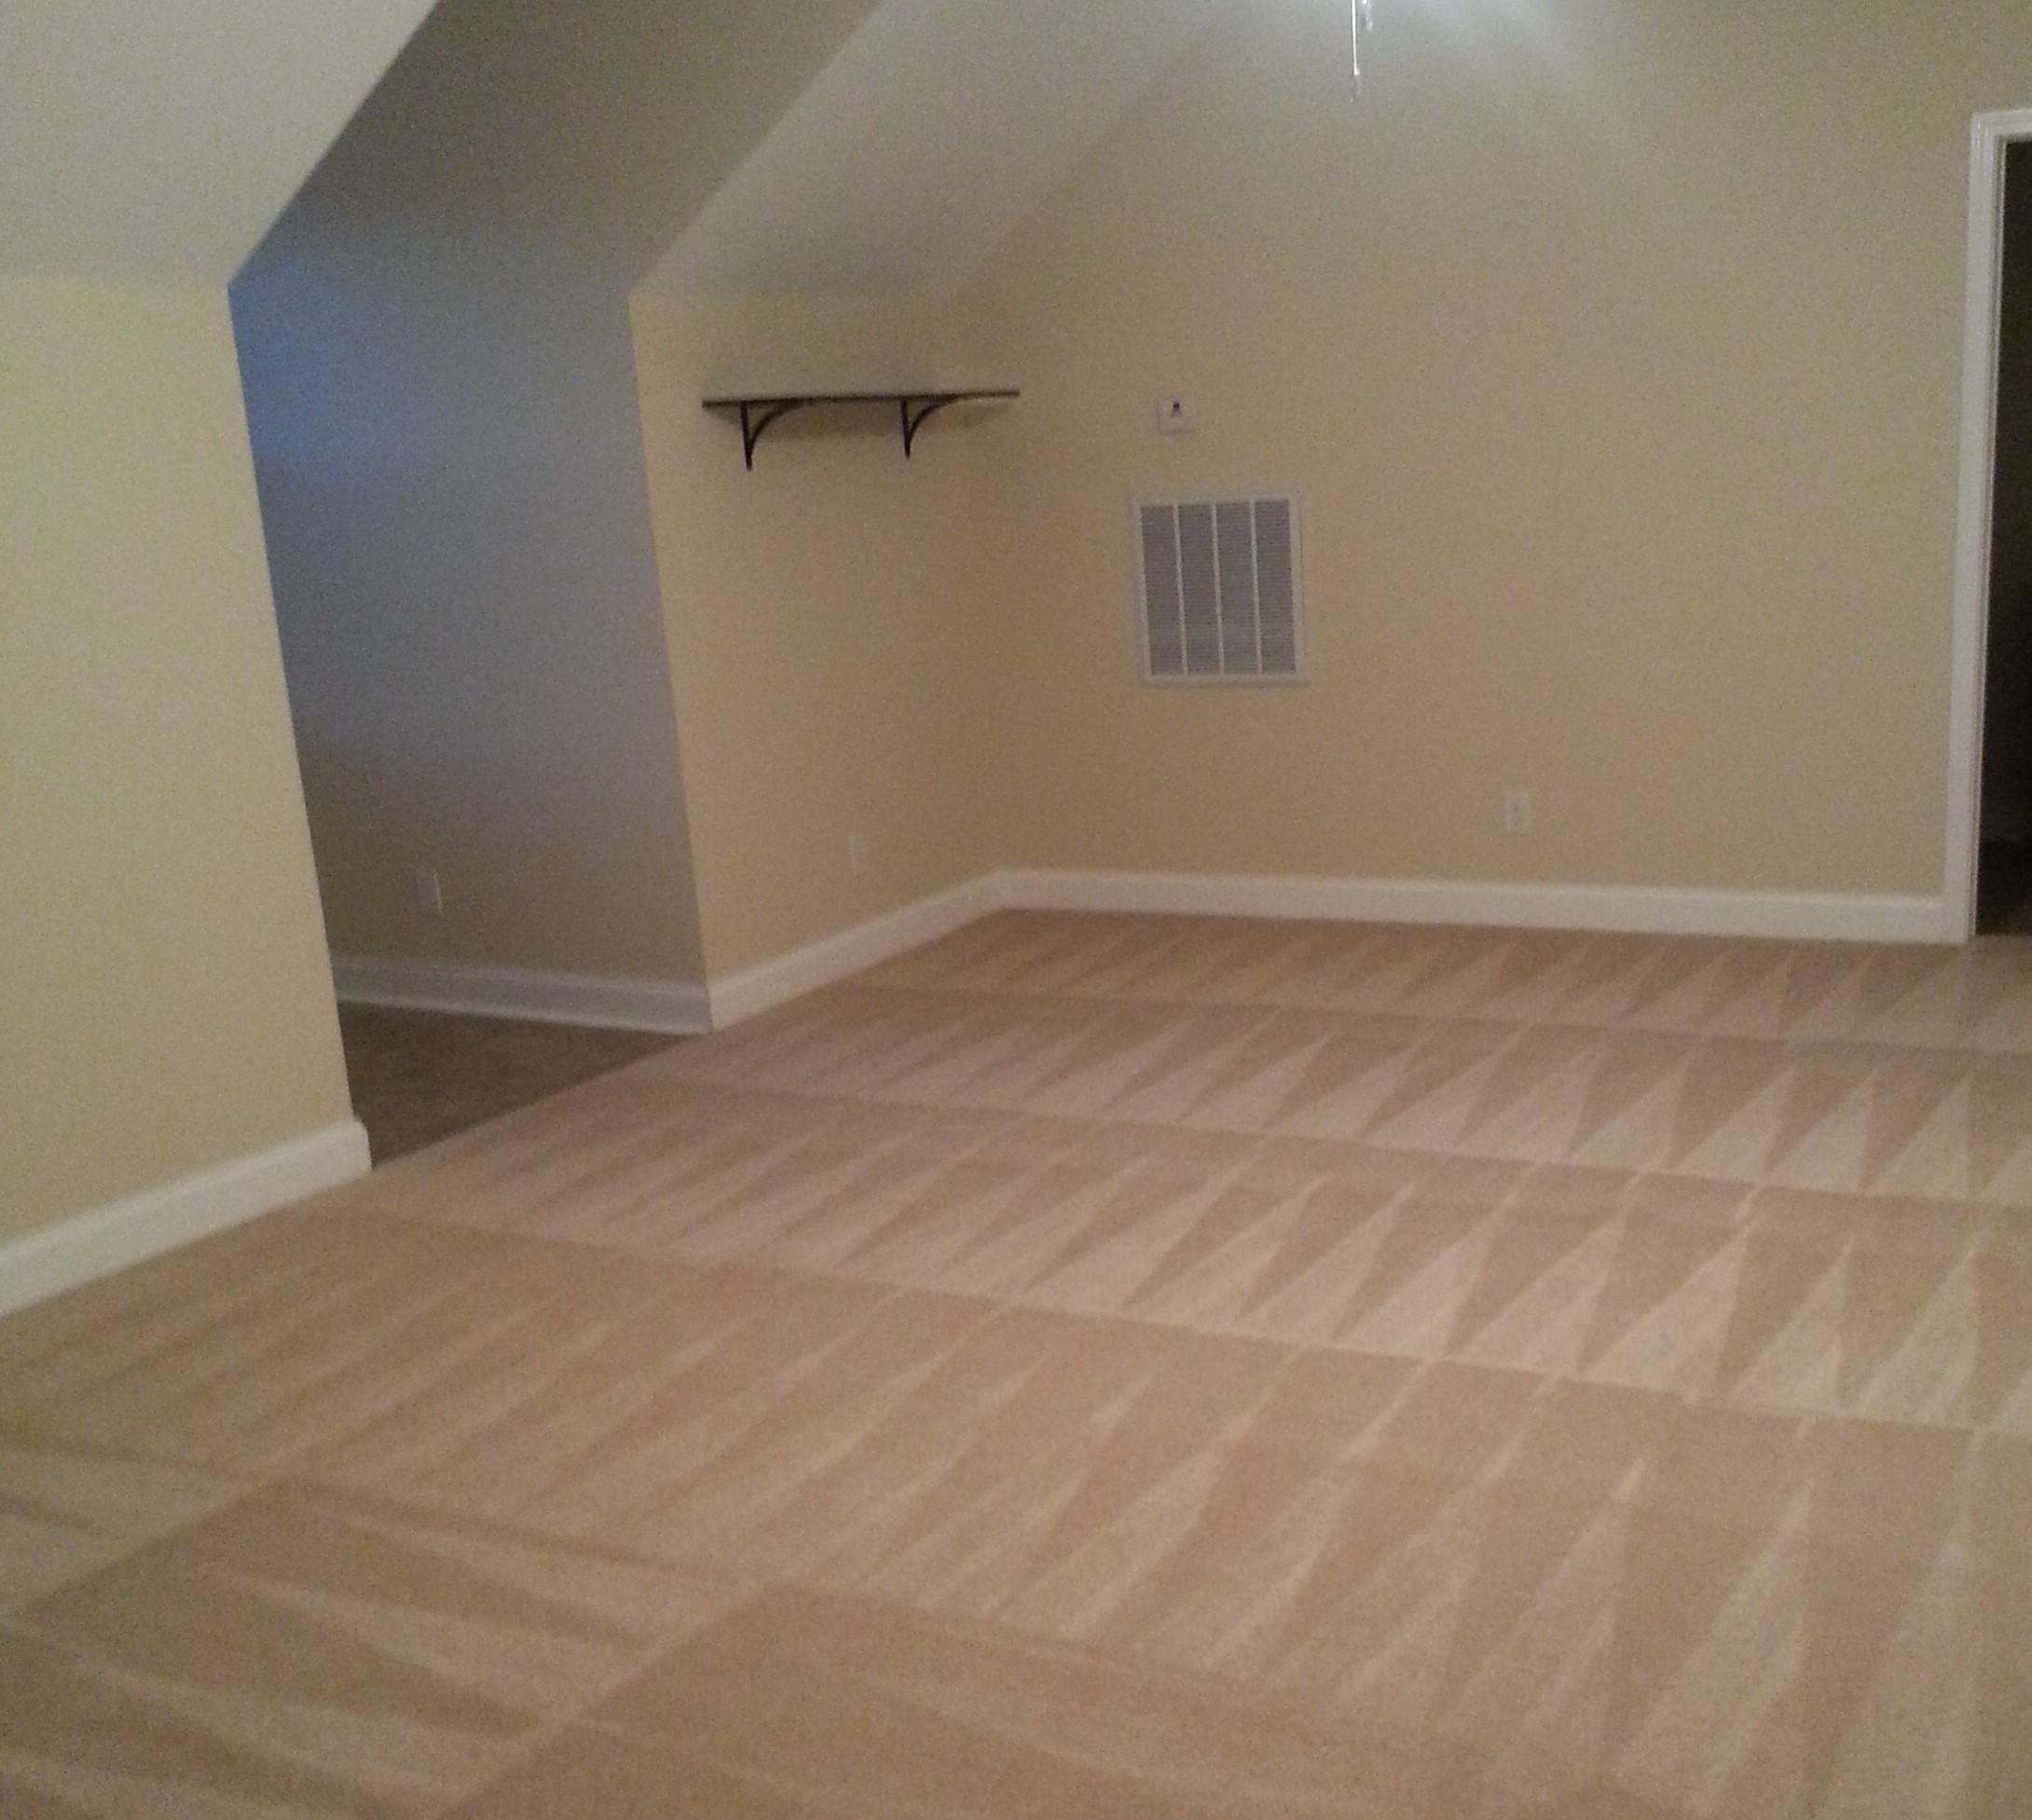 Tru Dry Carpet Dryclean Warner Robins Ga 31088 Yp Com